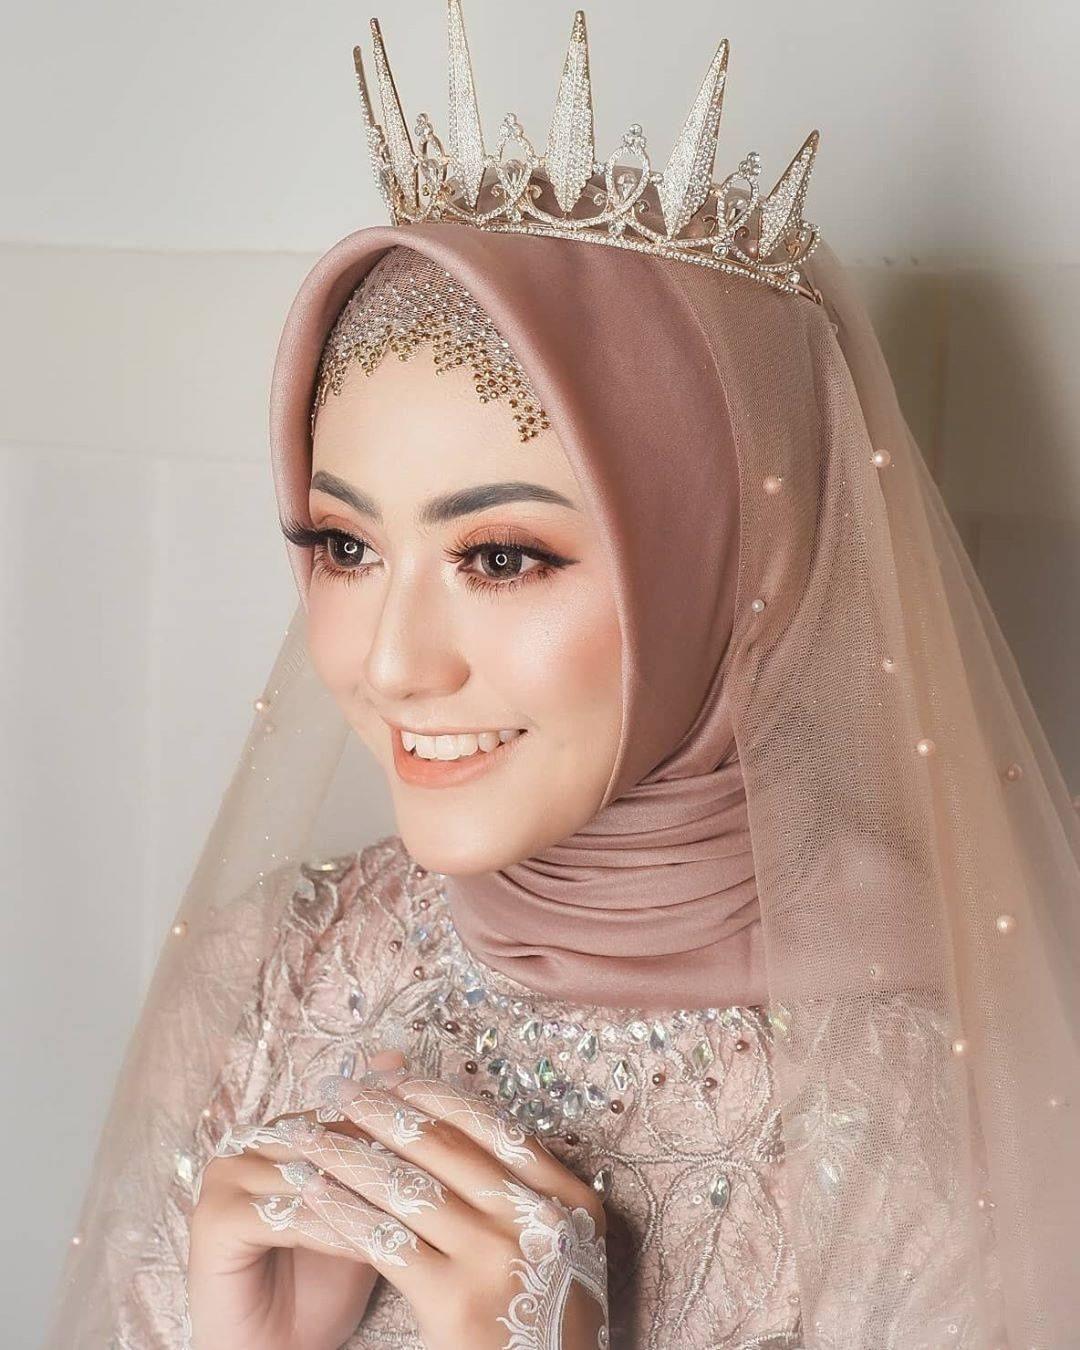 Inspirasi Makeup Pengantin Hijabers Yang Menawan Di Hari Bahagiamu Kerudung Pengantin Pengantin Berhijab Pengantin